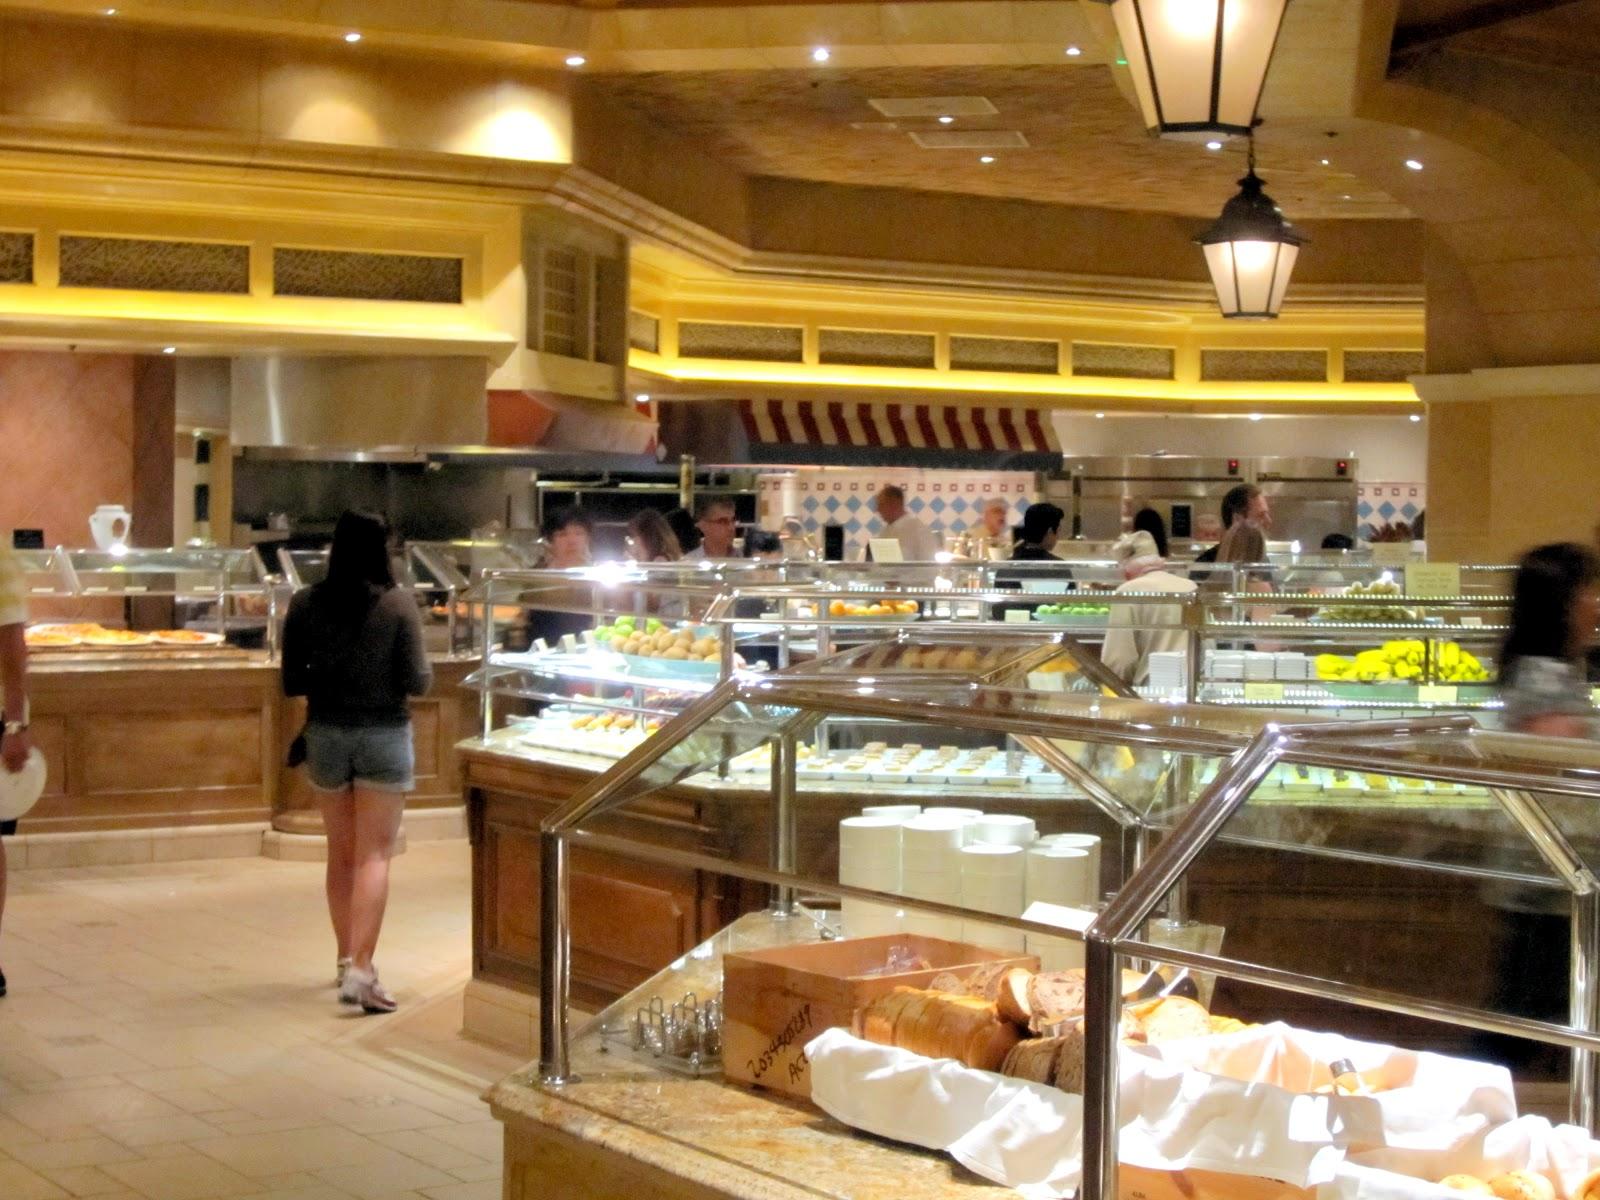 Fantastic The Buffet At Bellagio Las Vegas Rolling Writes Download Free Architecture Designs Intelgarnamadebymaigaardcom